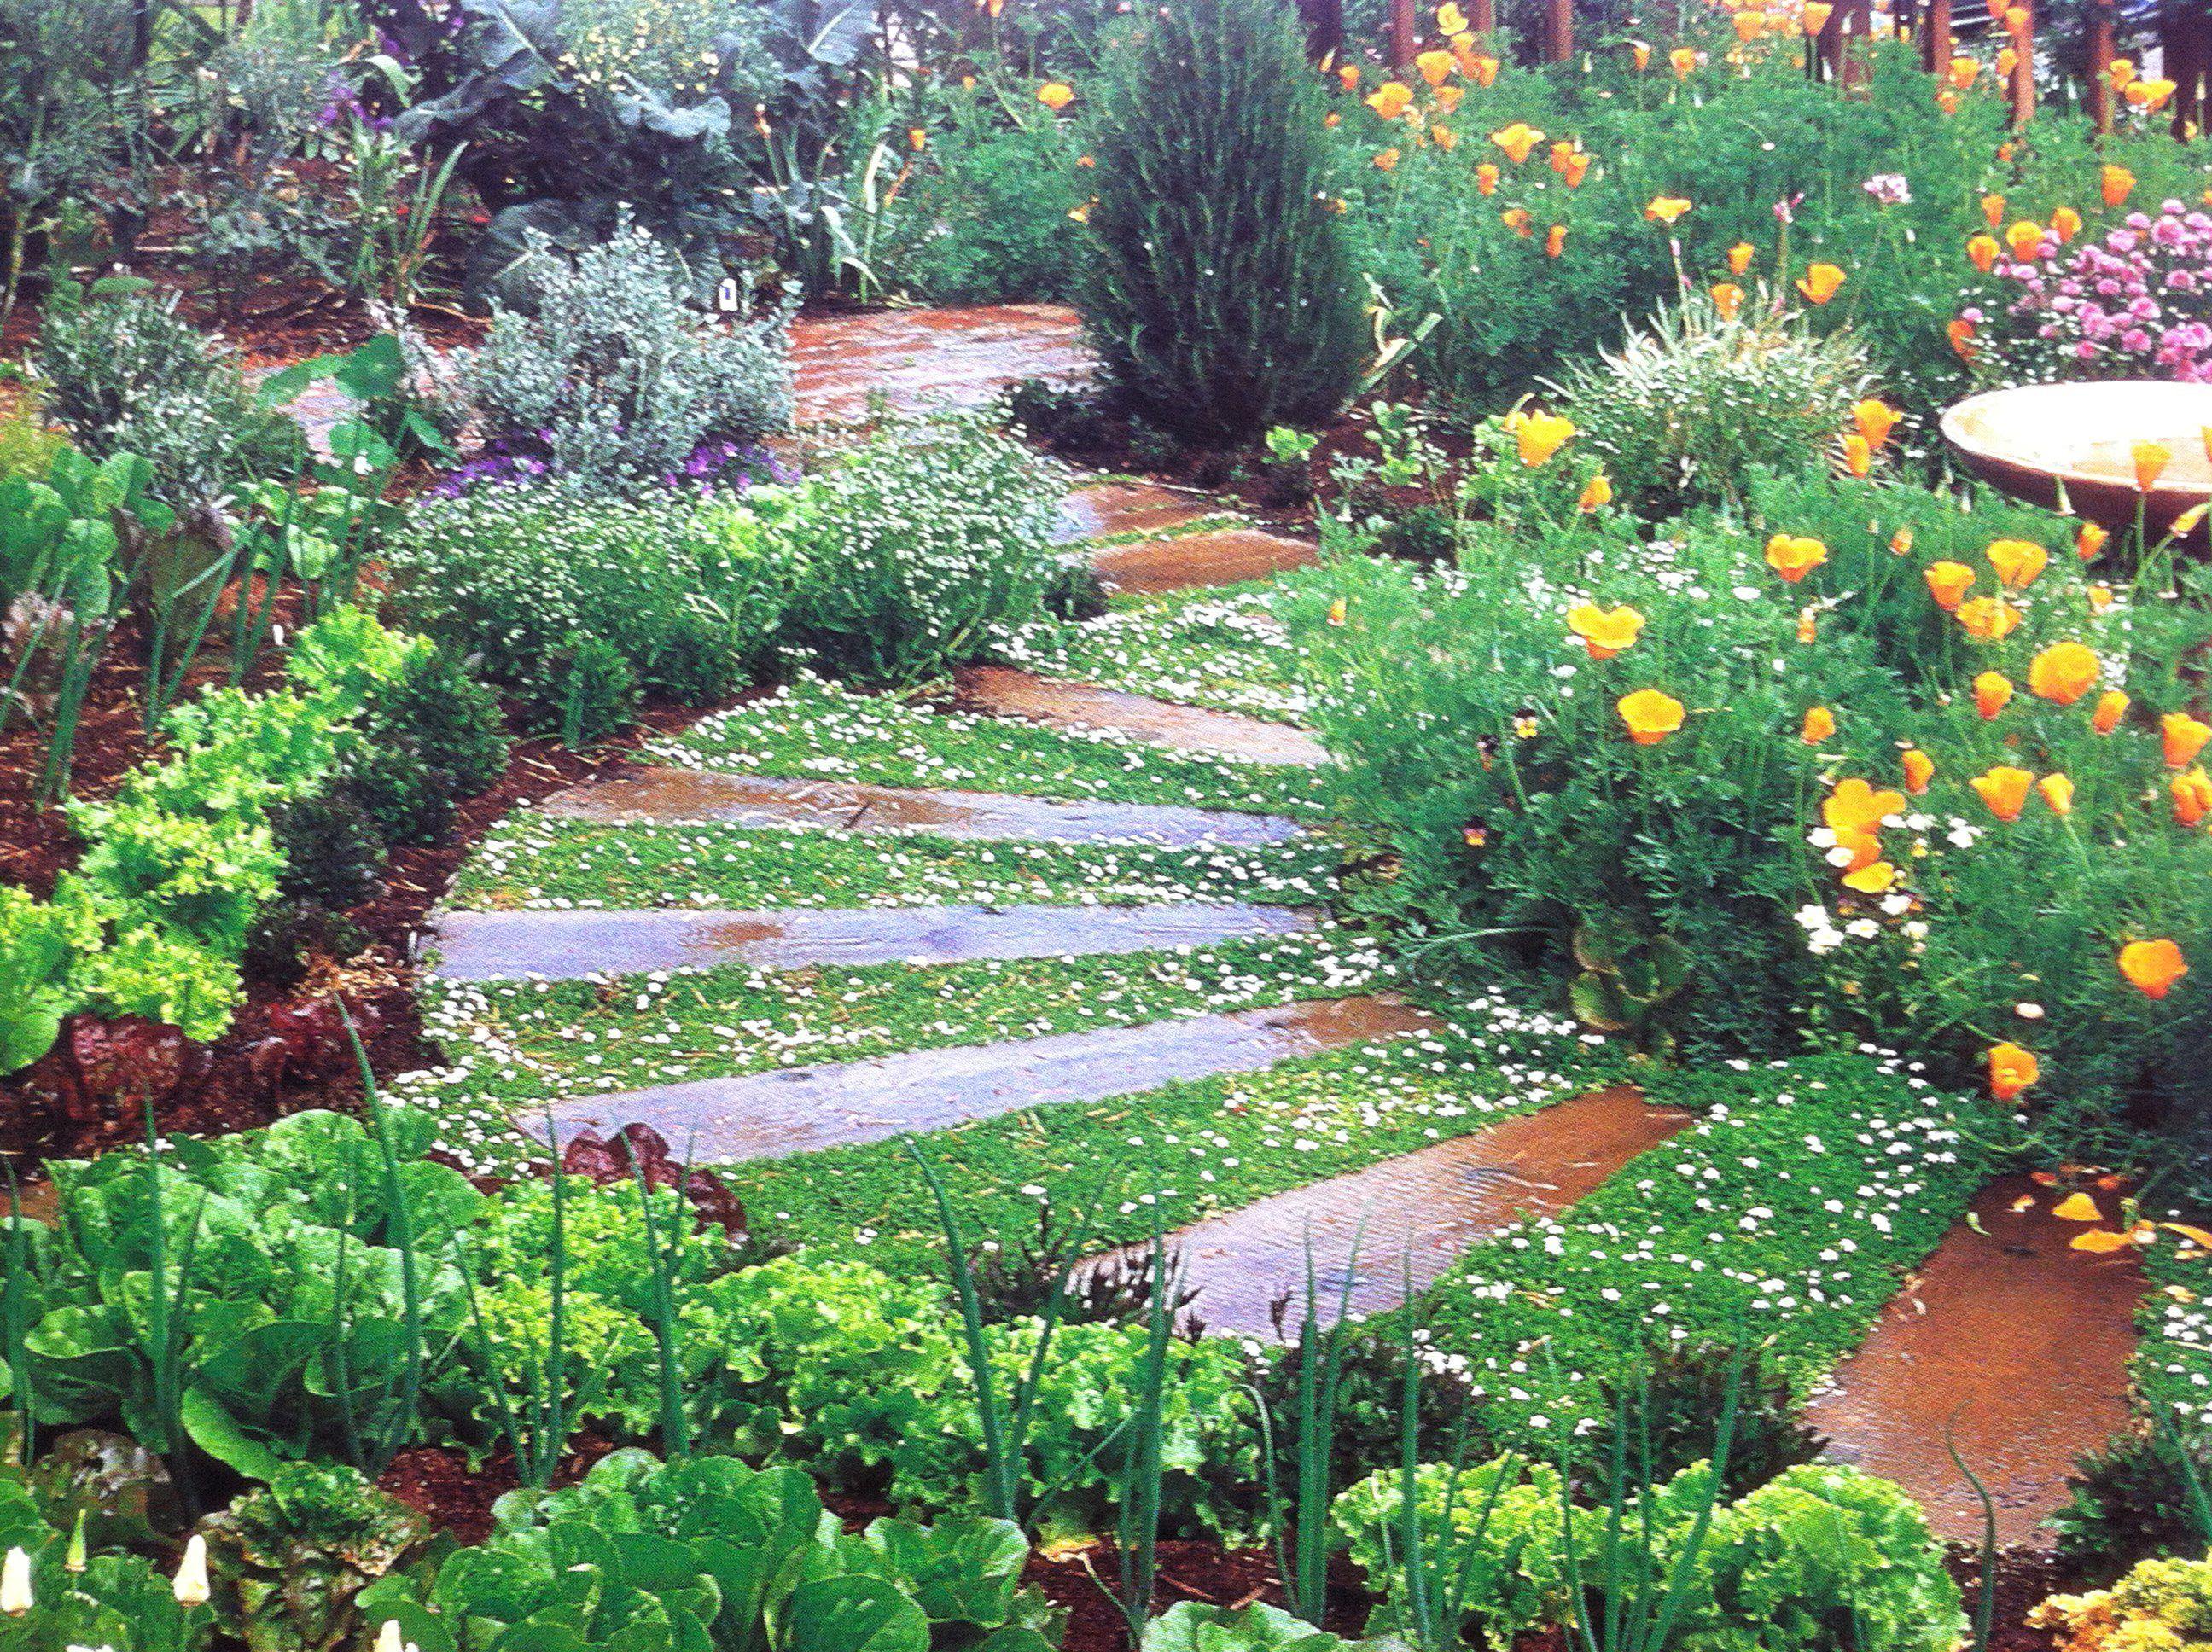 Pin By Austin Hart On Outdoors Garden Flower Beds Flower Garden Design Backyard Flowers Garden